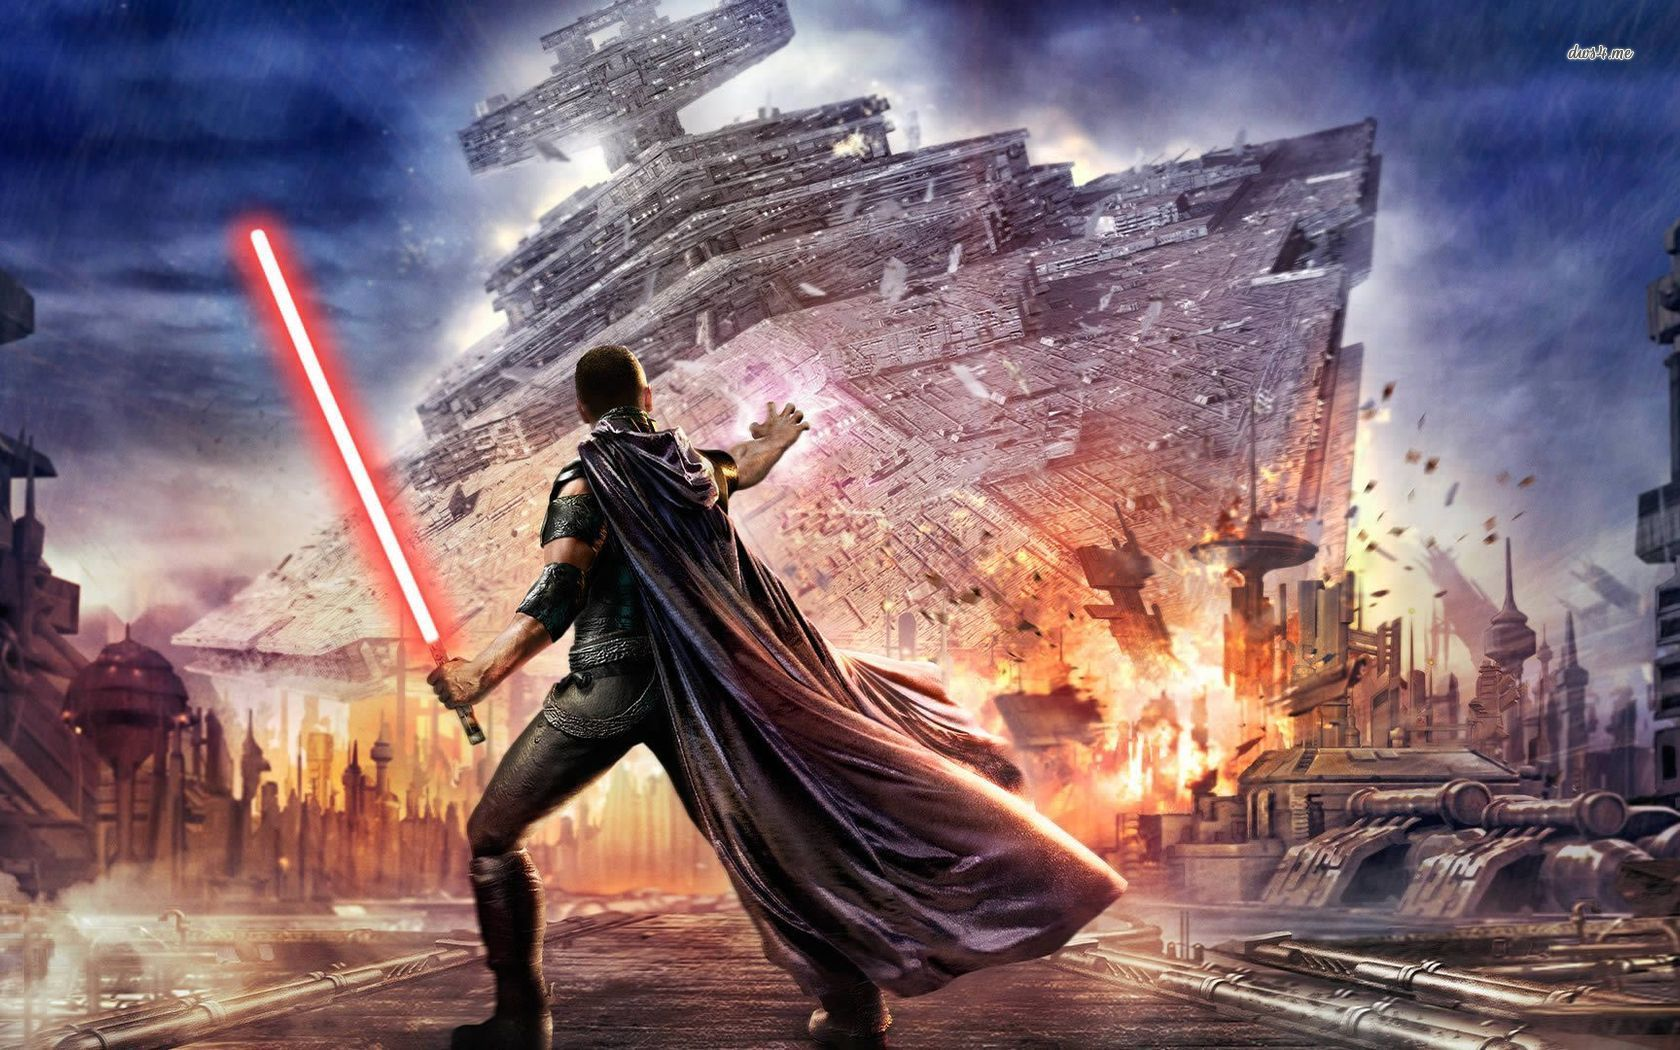 Star Wars The Force Unleashed HD Desktop Wallpaper Widescreen